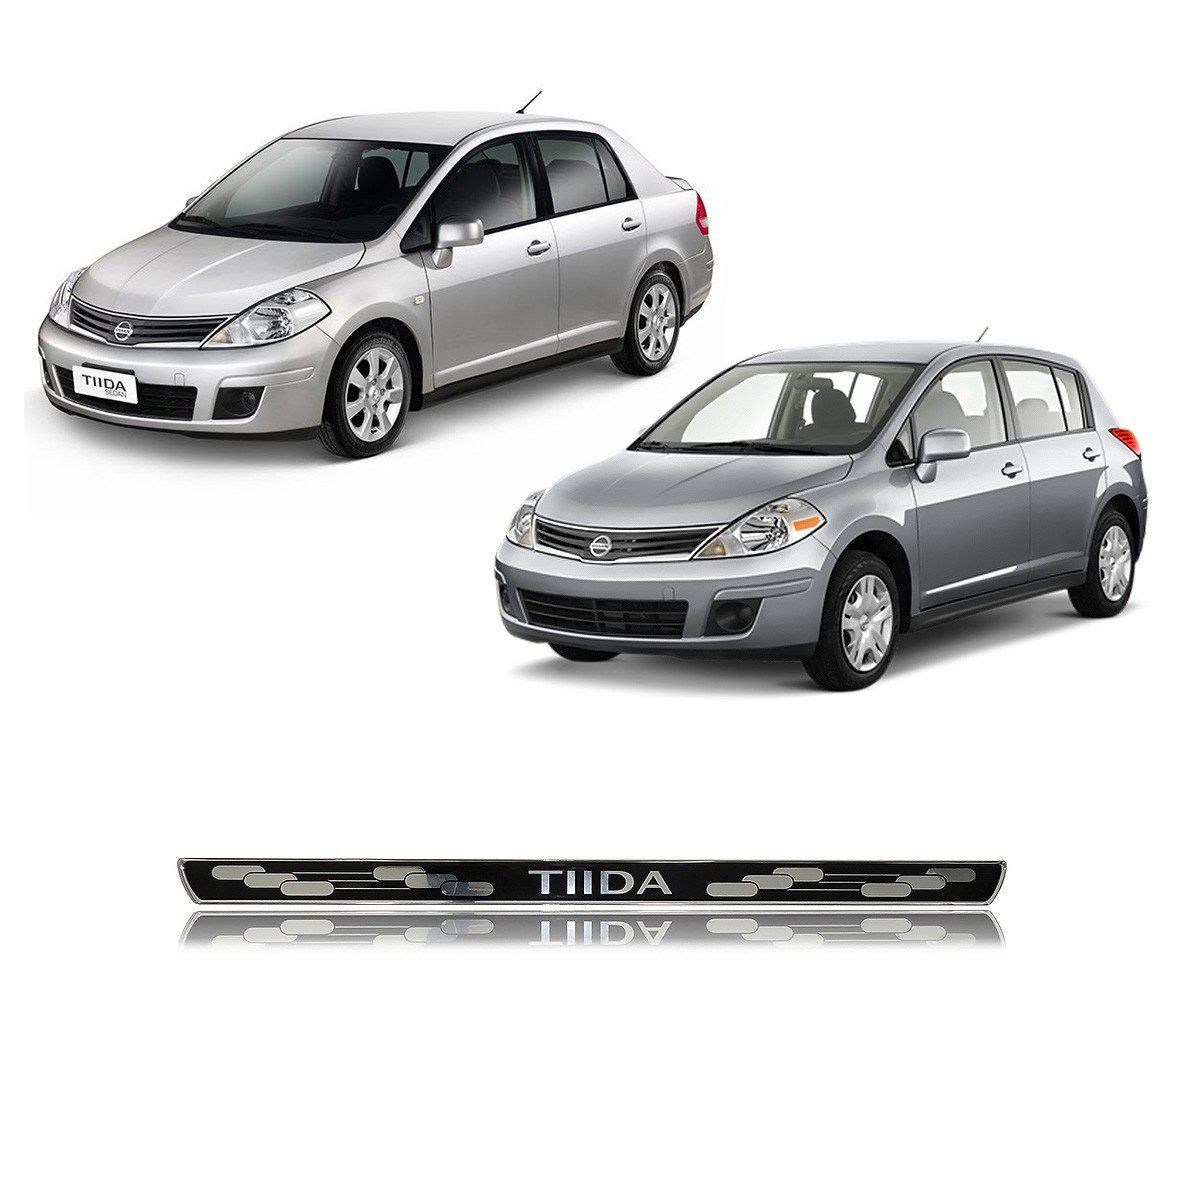 Soleira Porta Tiida Hatch e Sedan Resinada Elegance